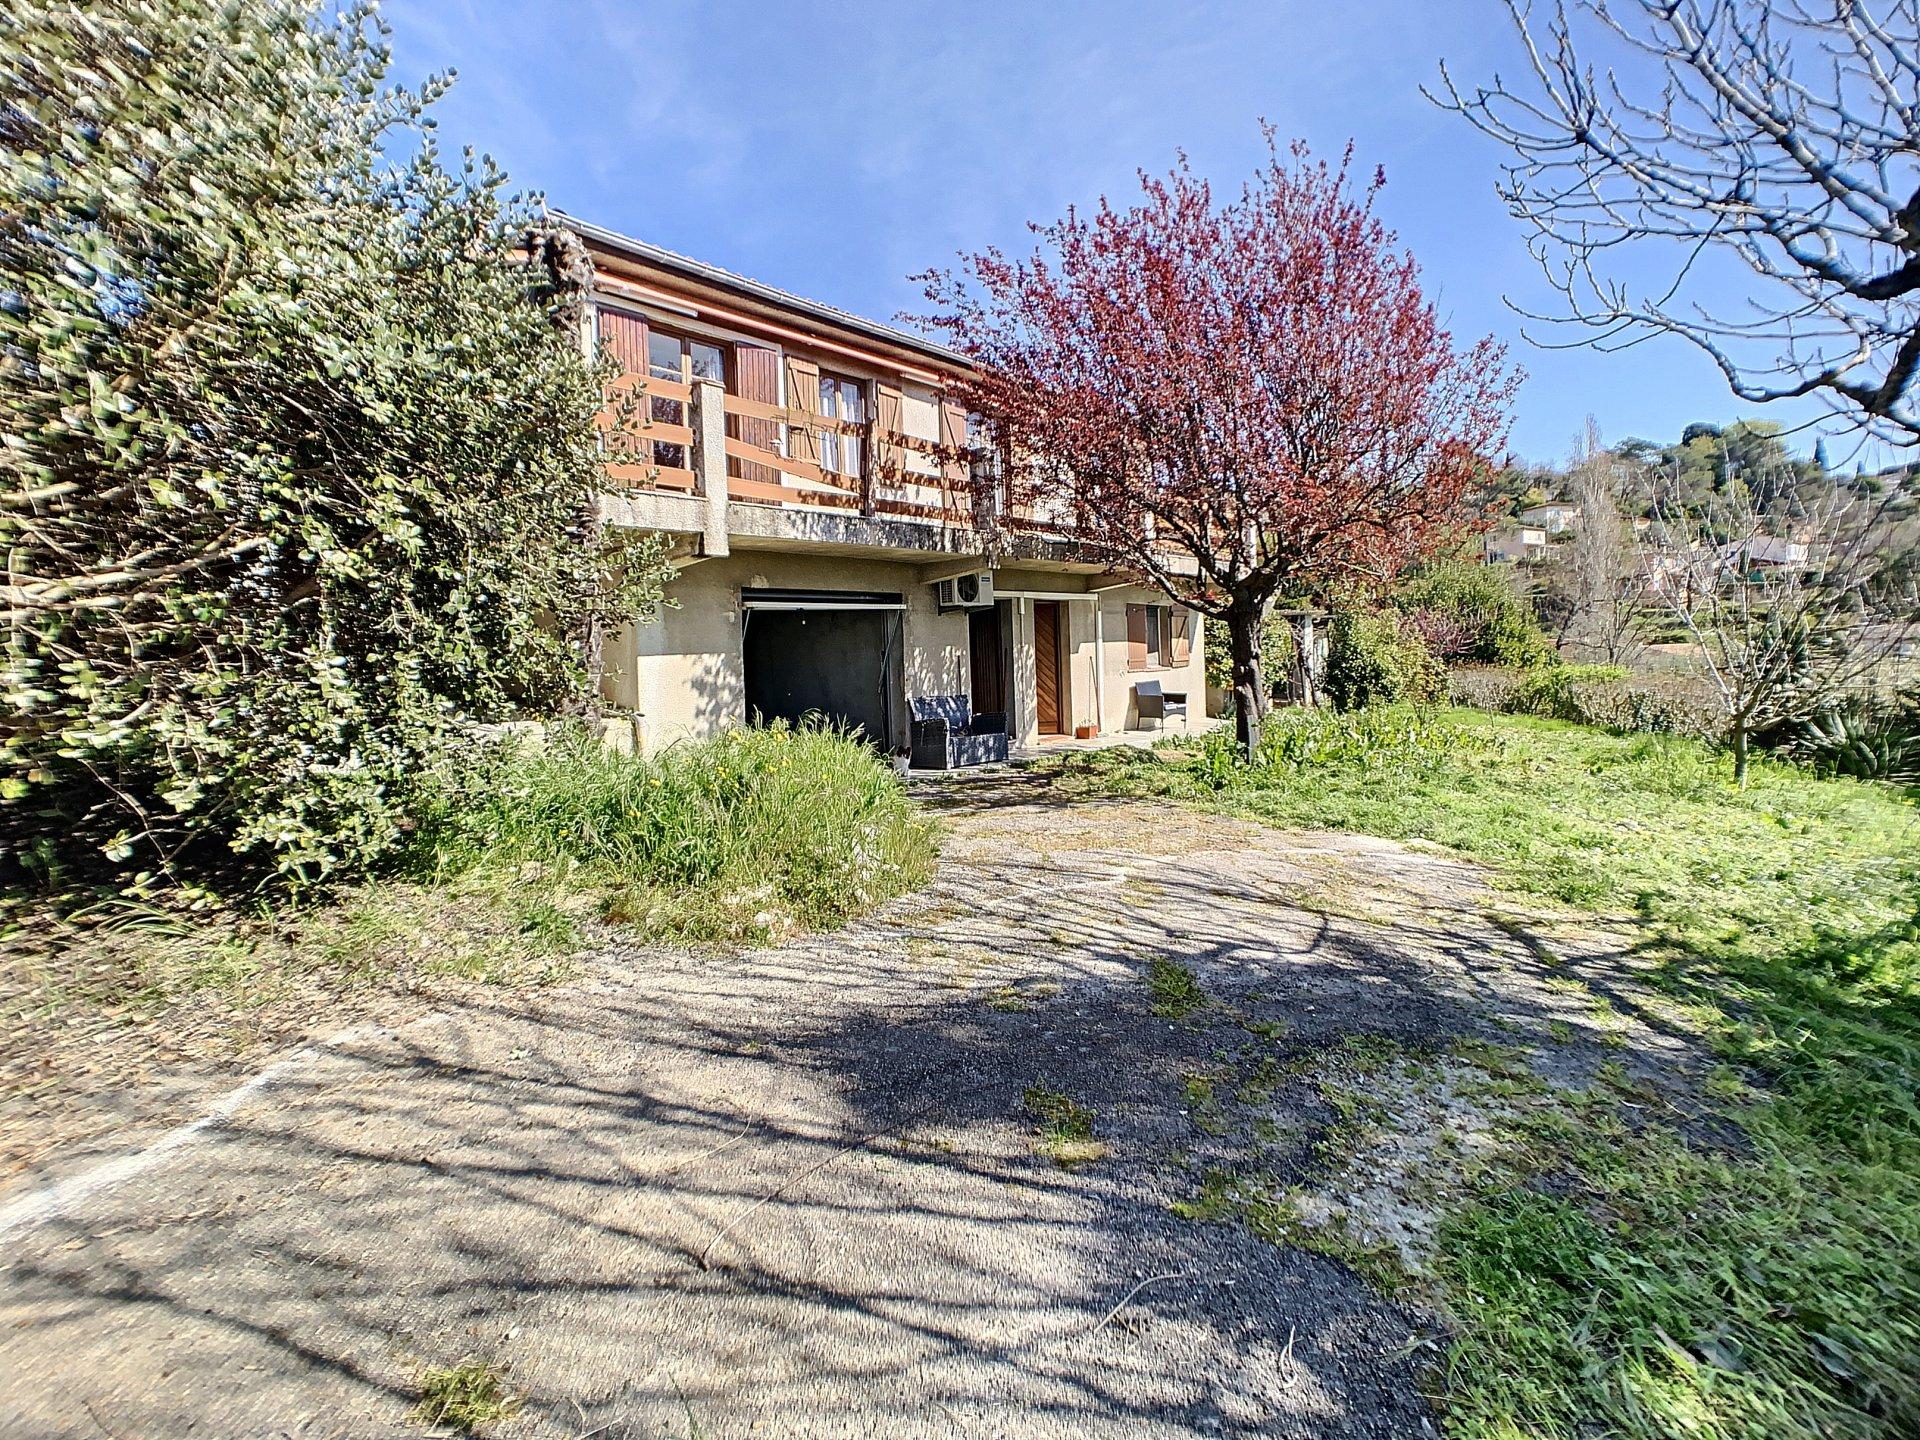 Villa 7/8 pièces terrain 2100 m2